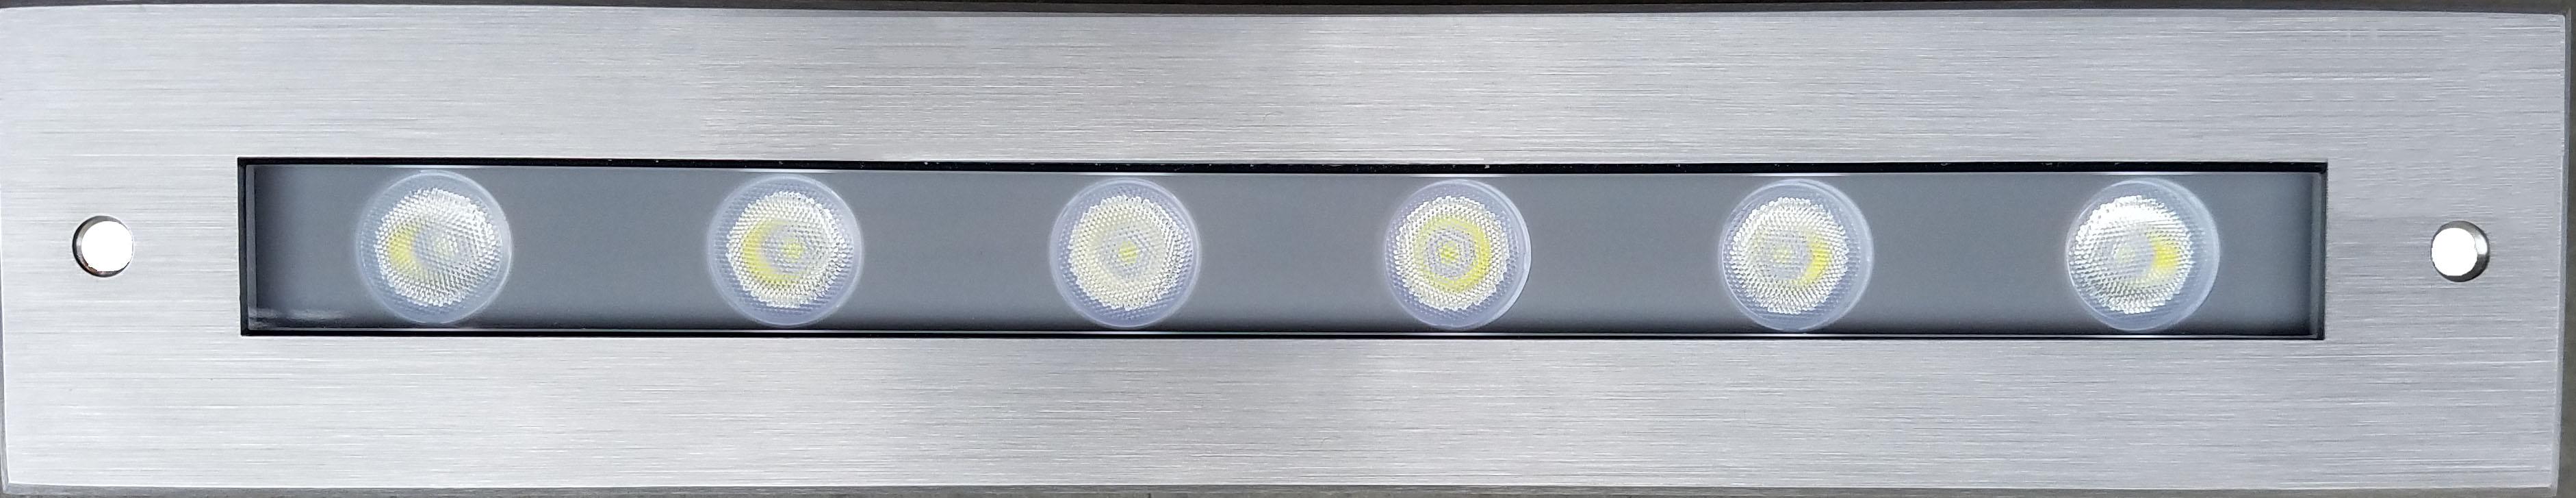 Cree LED 12W Linear Underground Light (G108)